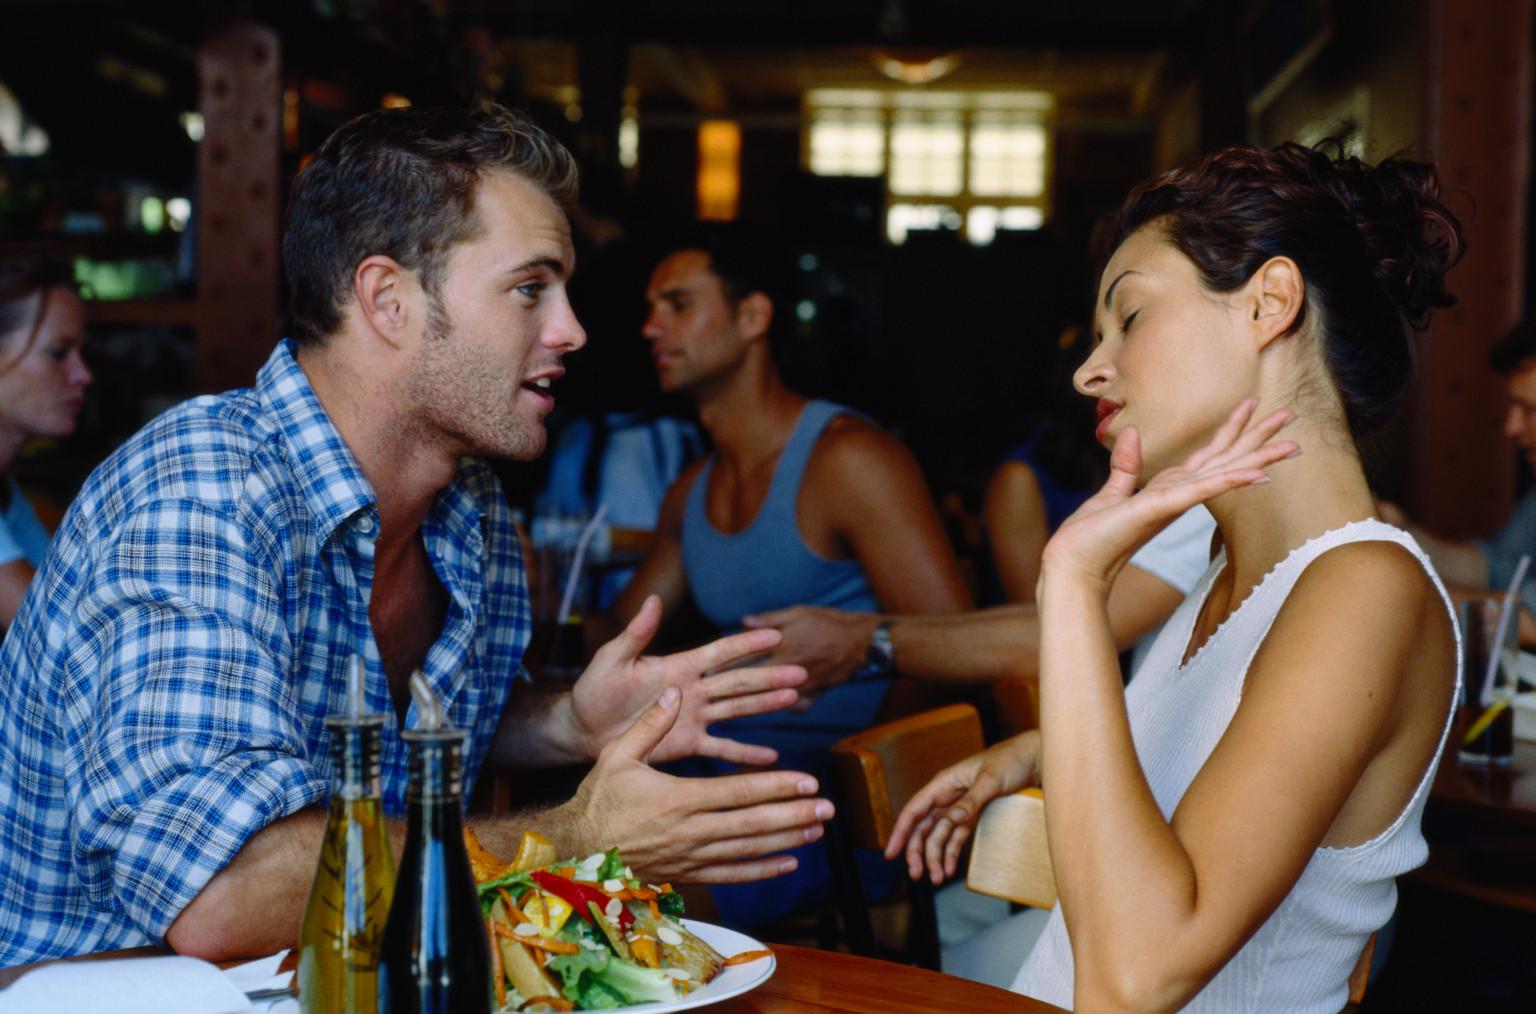 awww.couplescounselingchicago.net_wp_content_uploads_2014_11_couples_arguing.